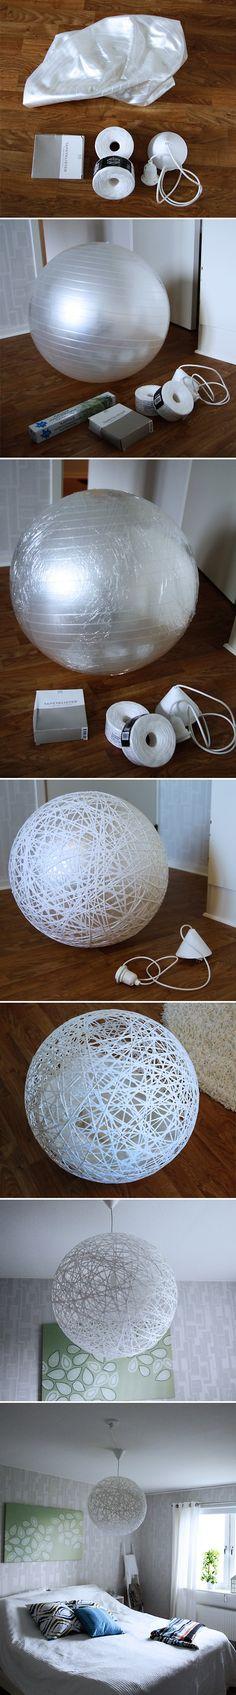 Make a big ball shade for a light